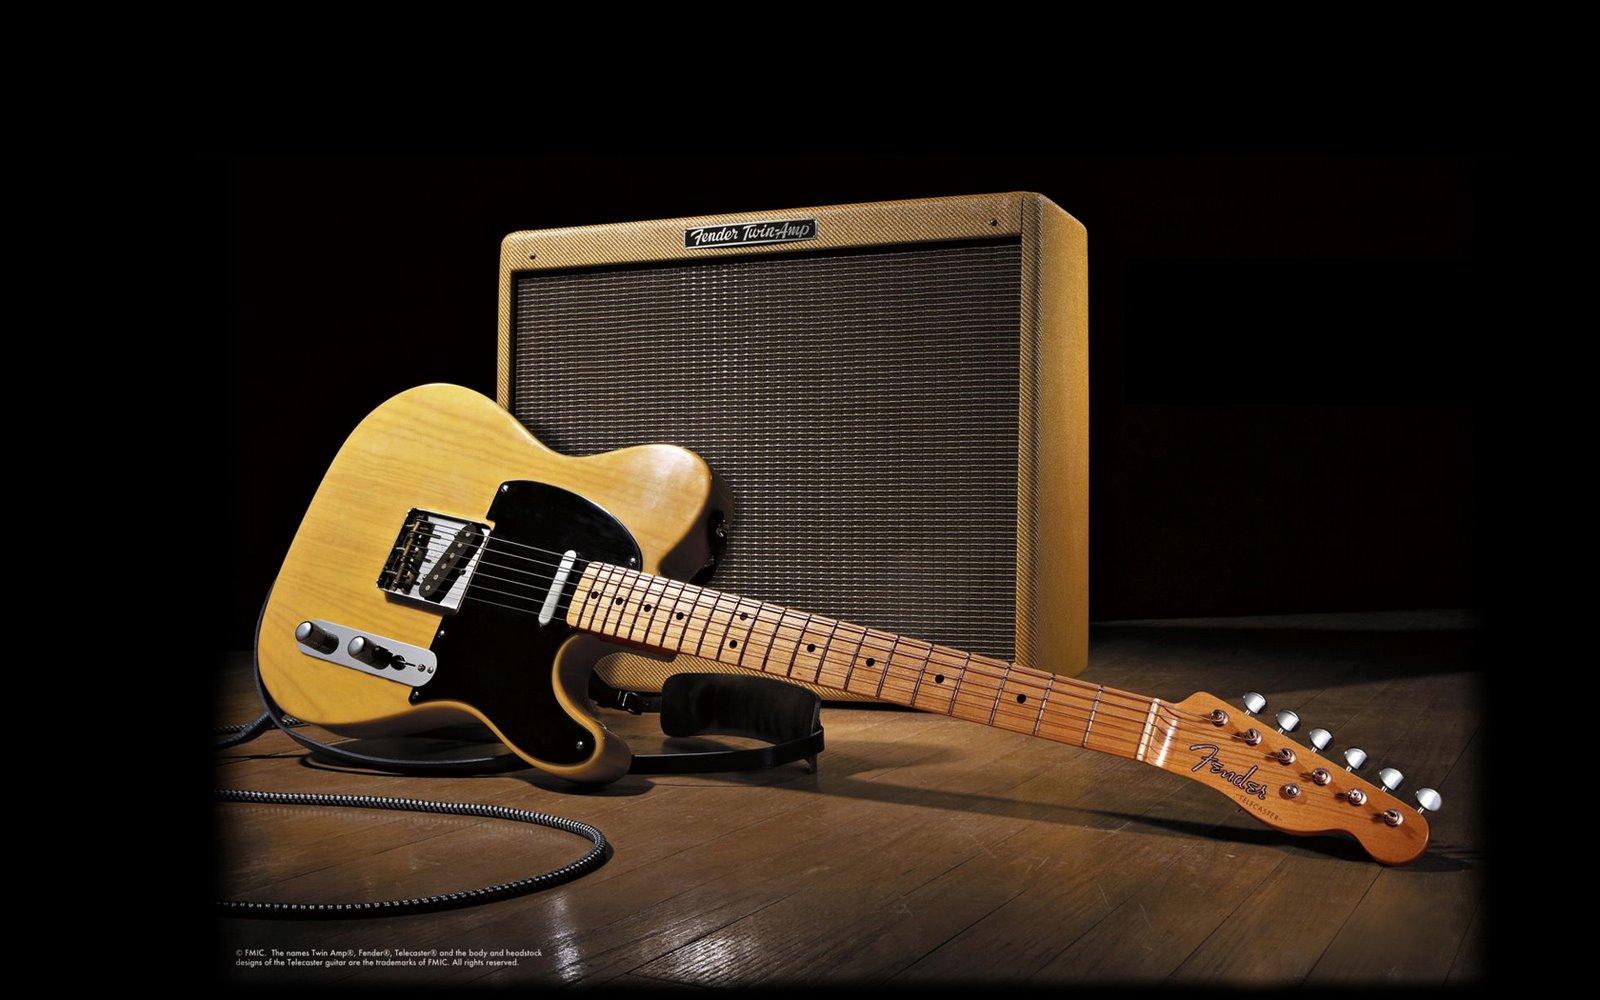 hd widescreen - spanish guitar - adorable spanish guitar wallpapers